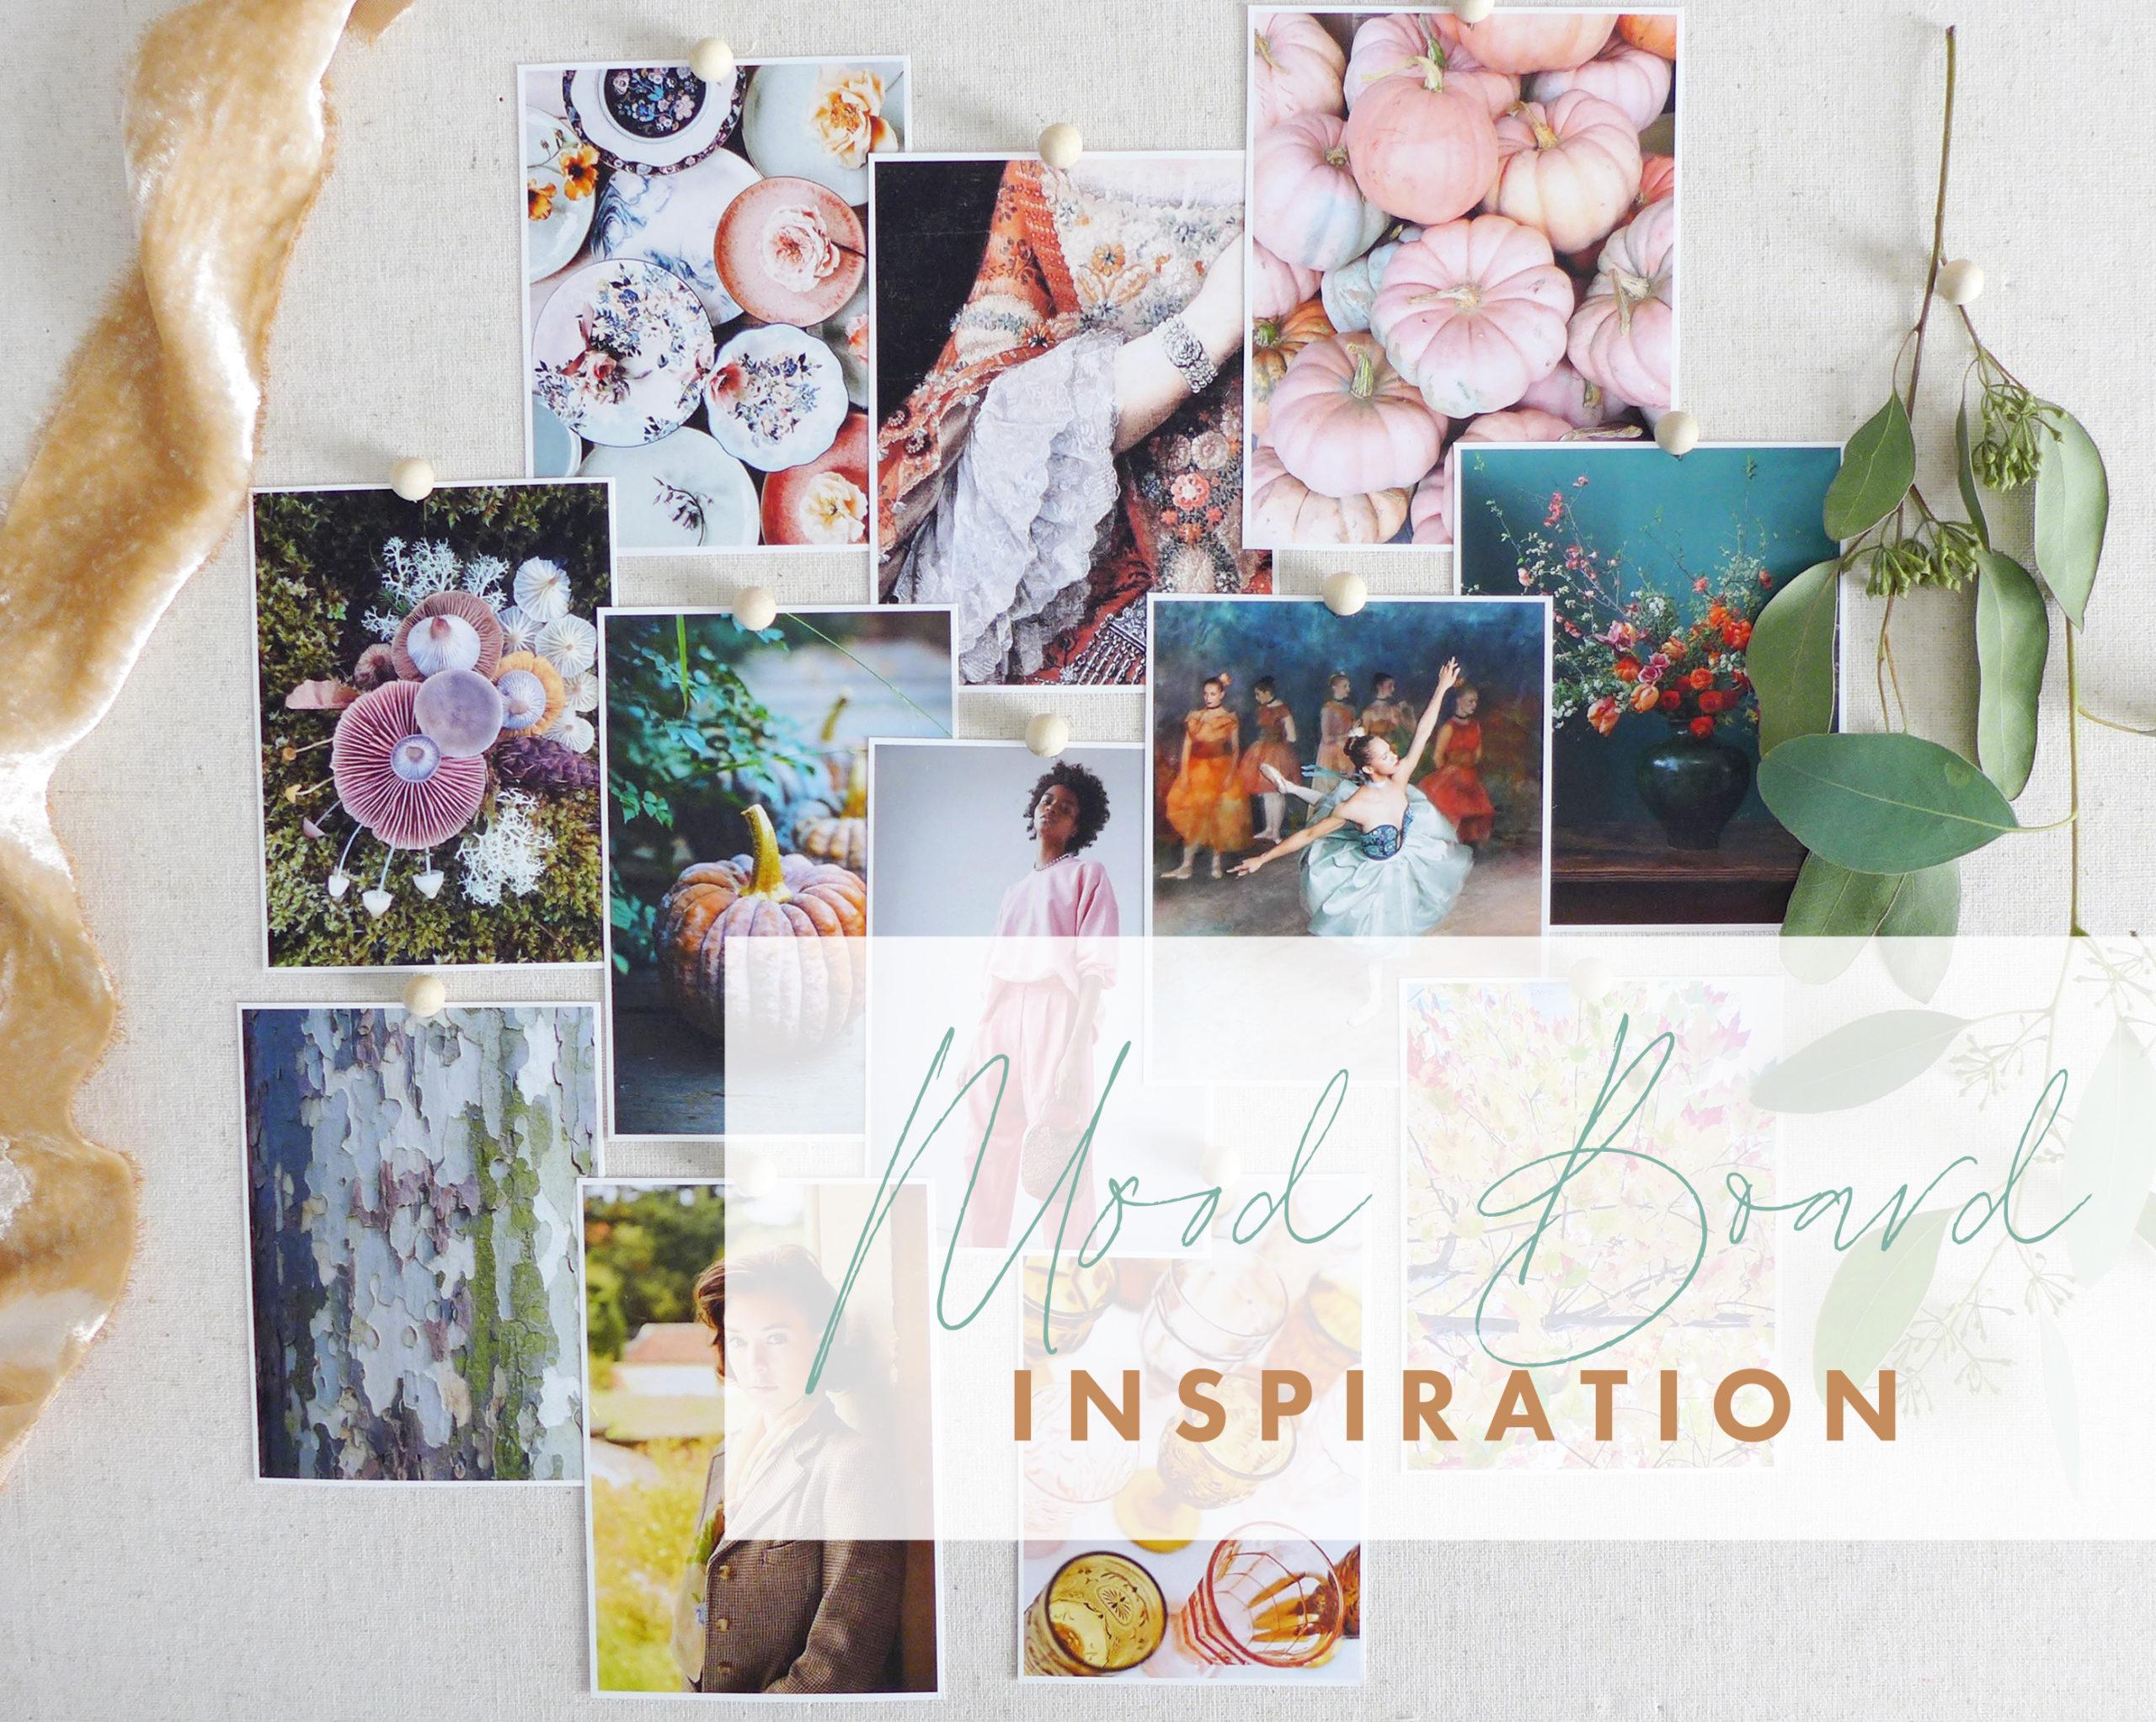 Fall 2020 Mood Board by Joanna Baker